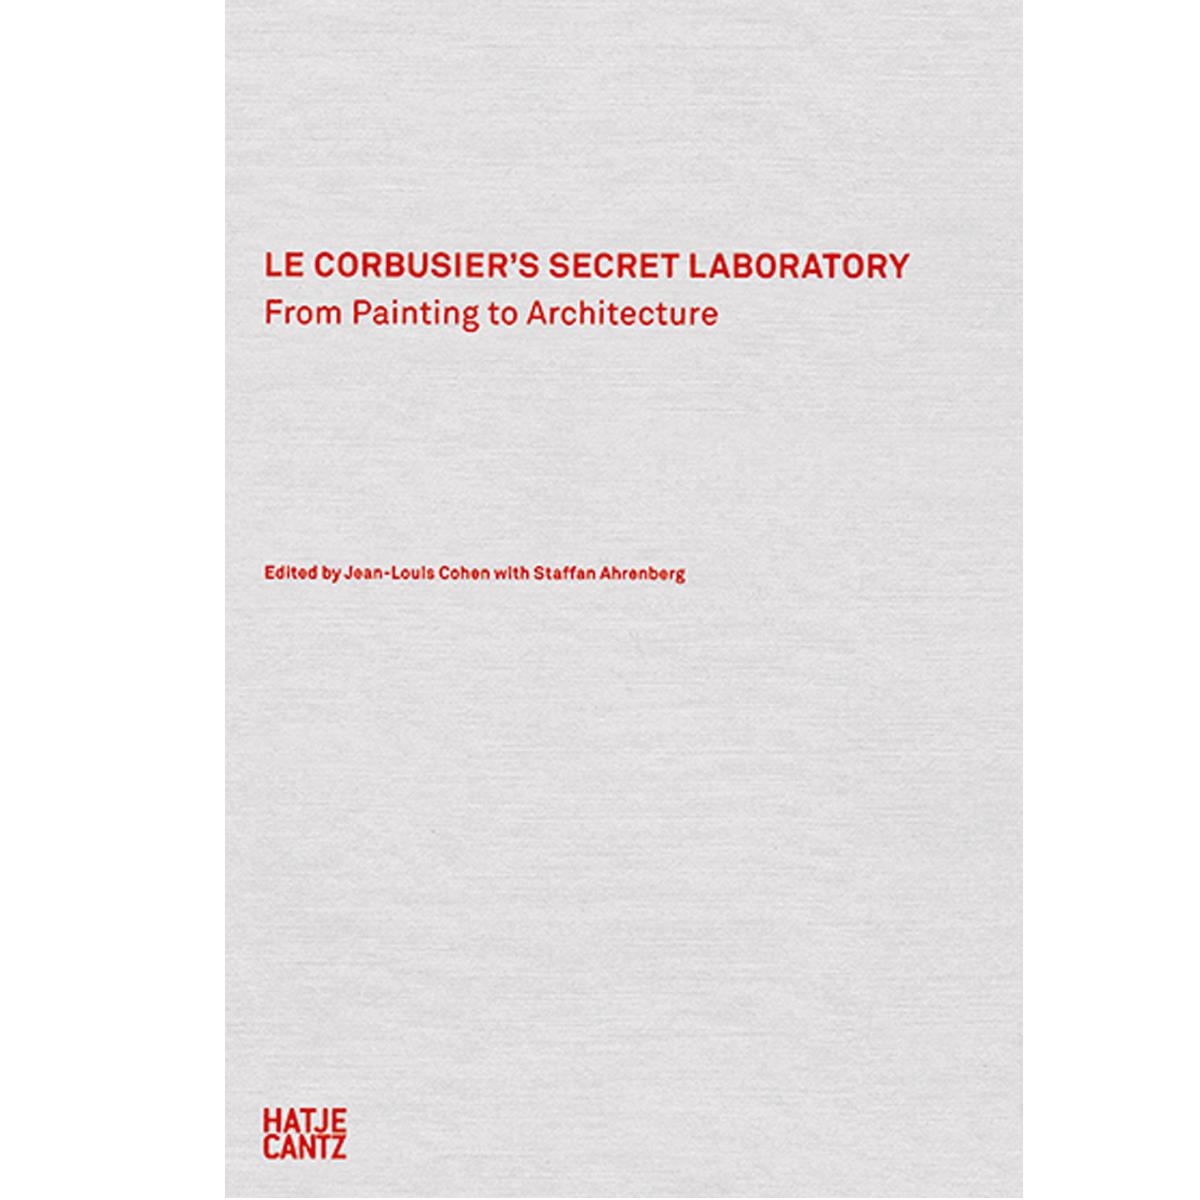 Le Corbusier's Secret Laboratory